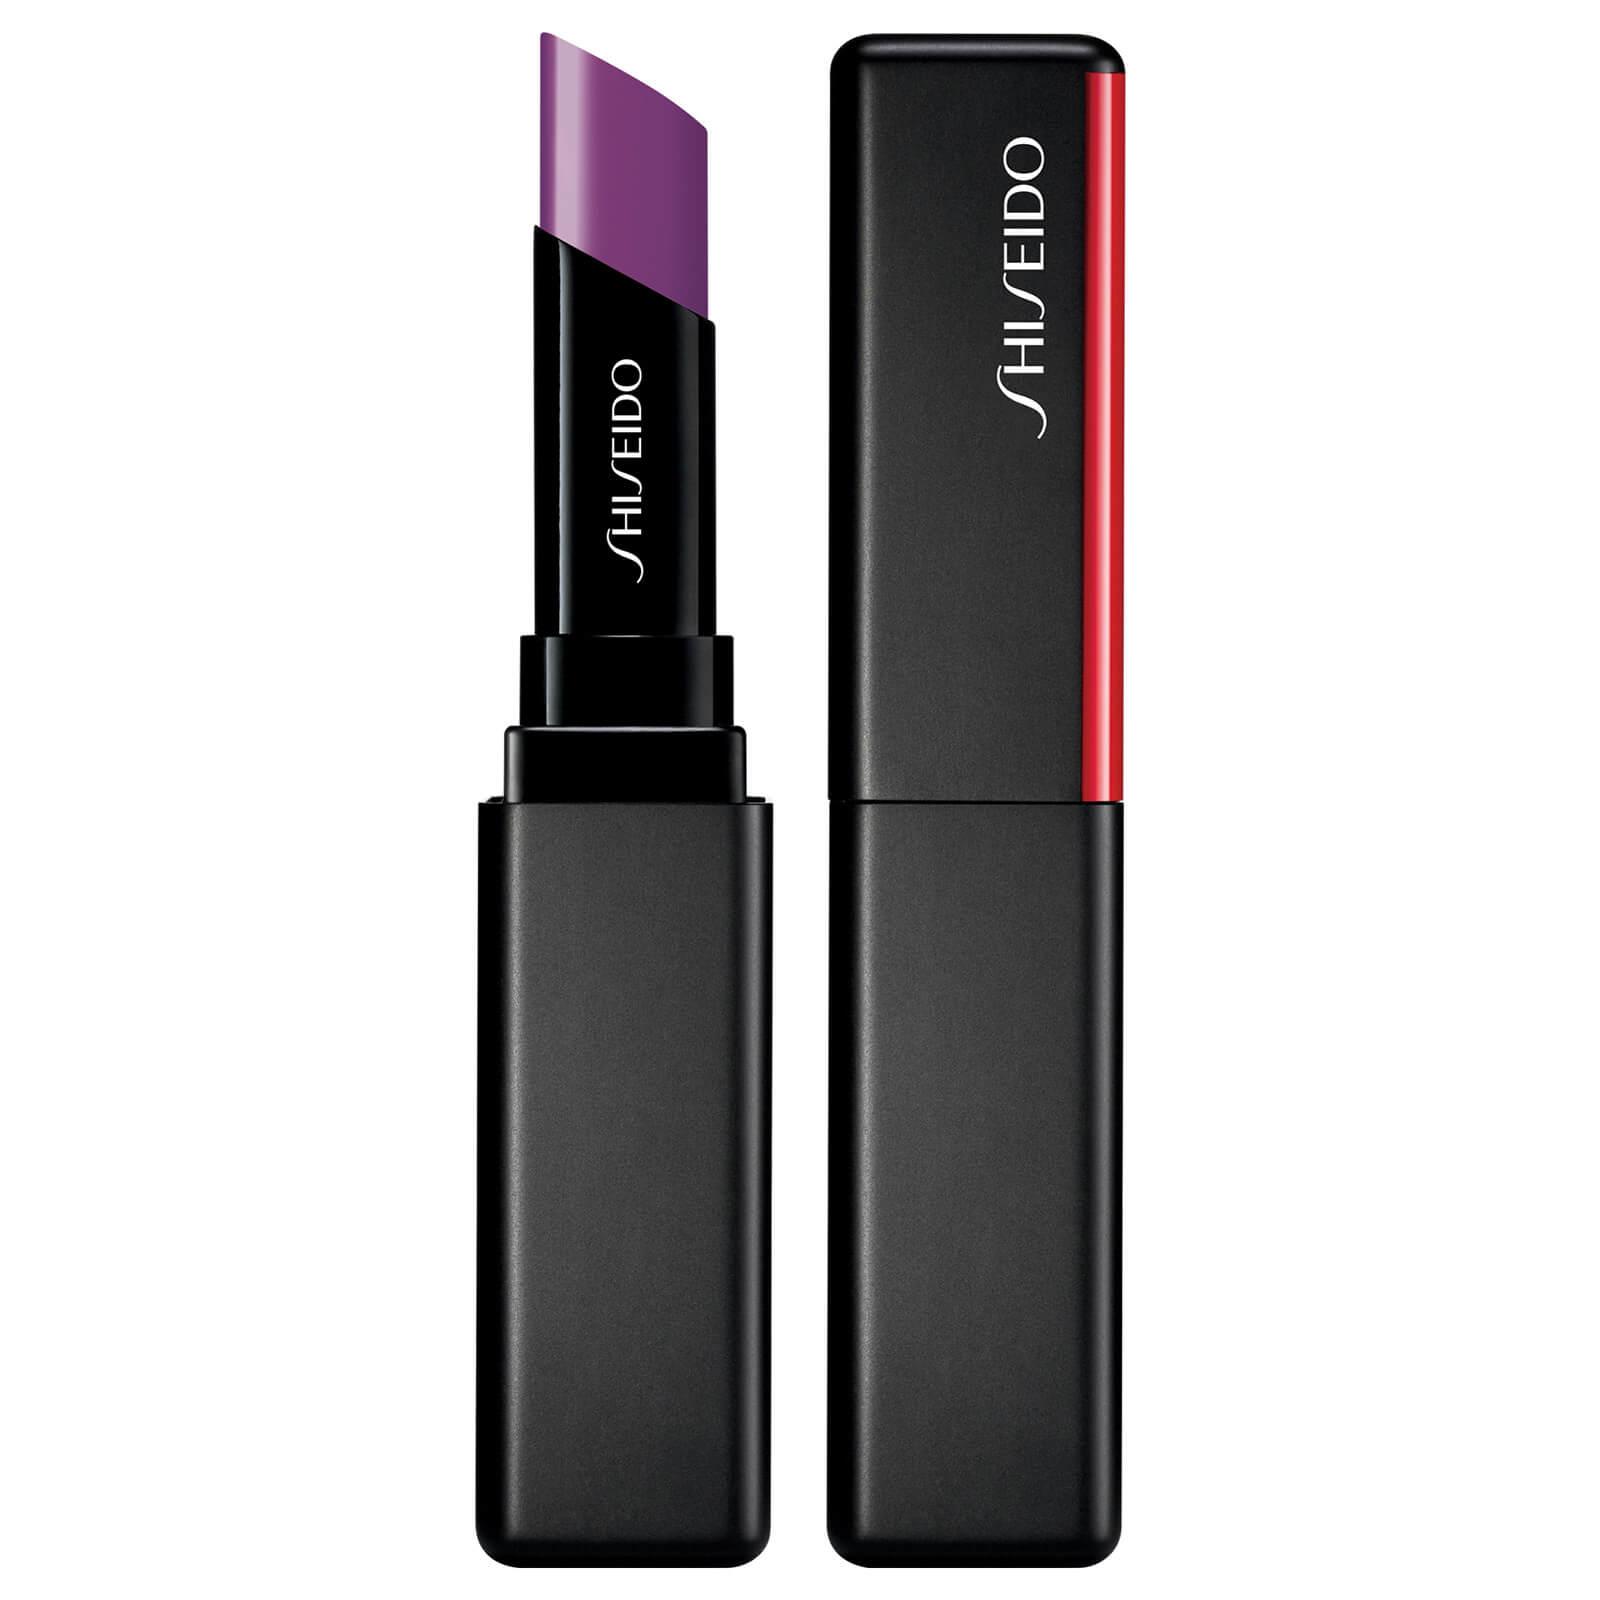 Shiseido Colorgel Lipbalm 2g (Various Shades) - Lilac